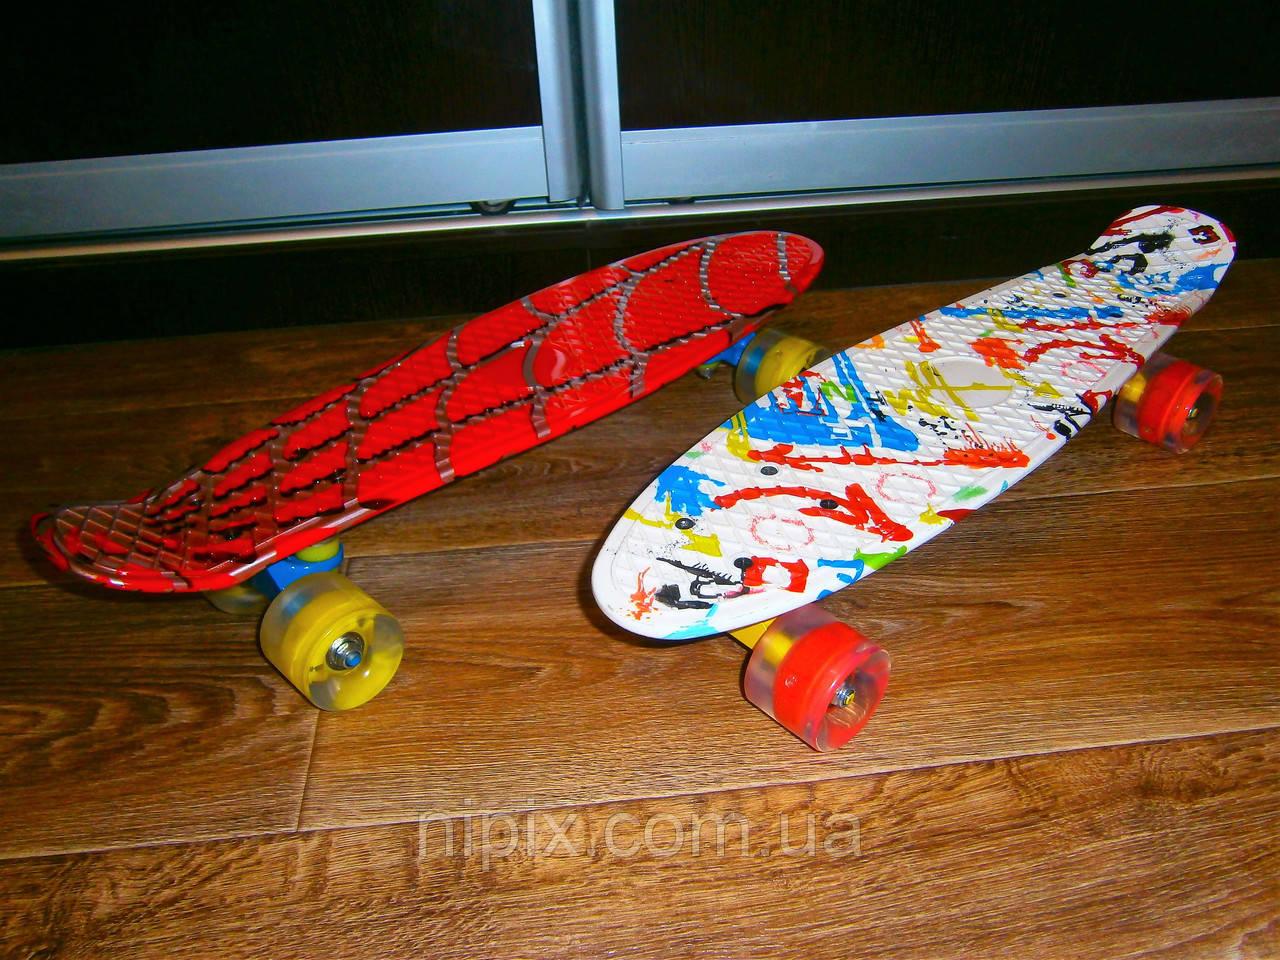 Скейт борд, Пенни борд 22 дюйма с ярким принтом и светящимися колесами